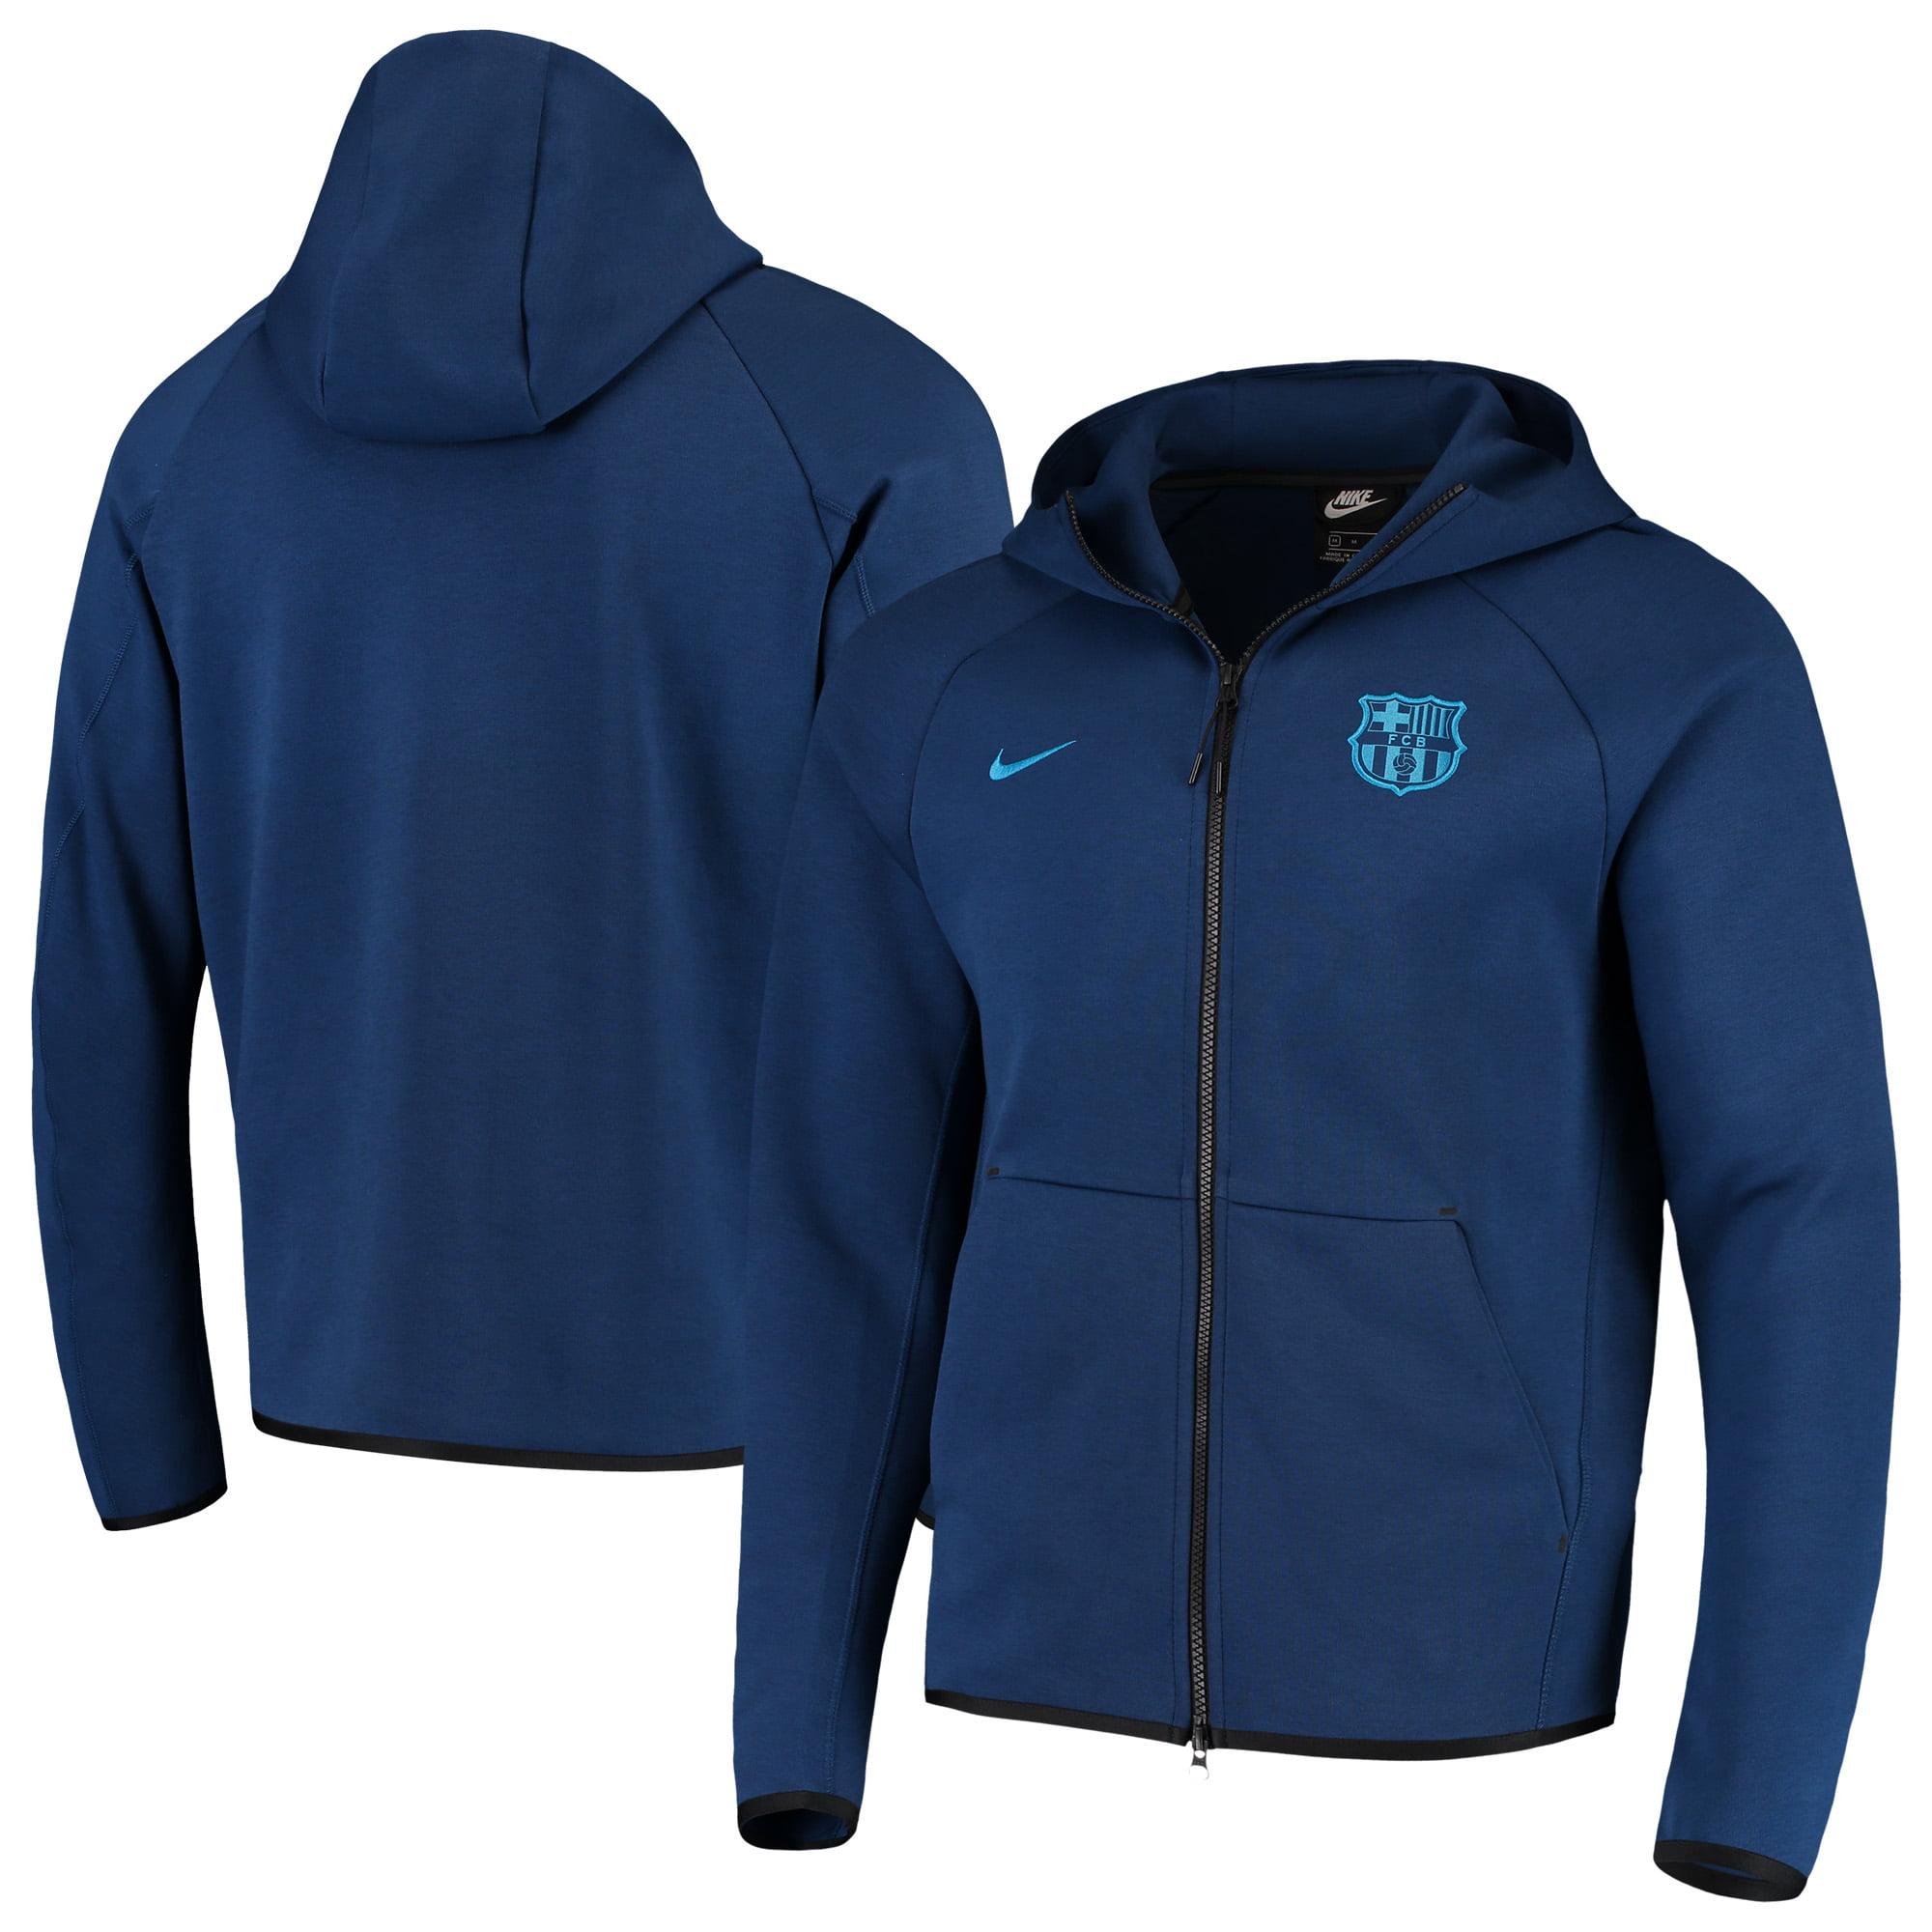 Nike - Barcelona Nike Tech Fleece Full-Zip Hoodie - Navy - Walmart.com 8b85f1181af3